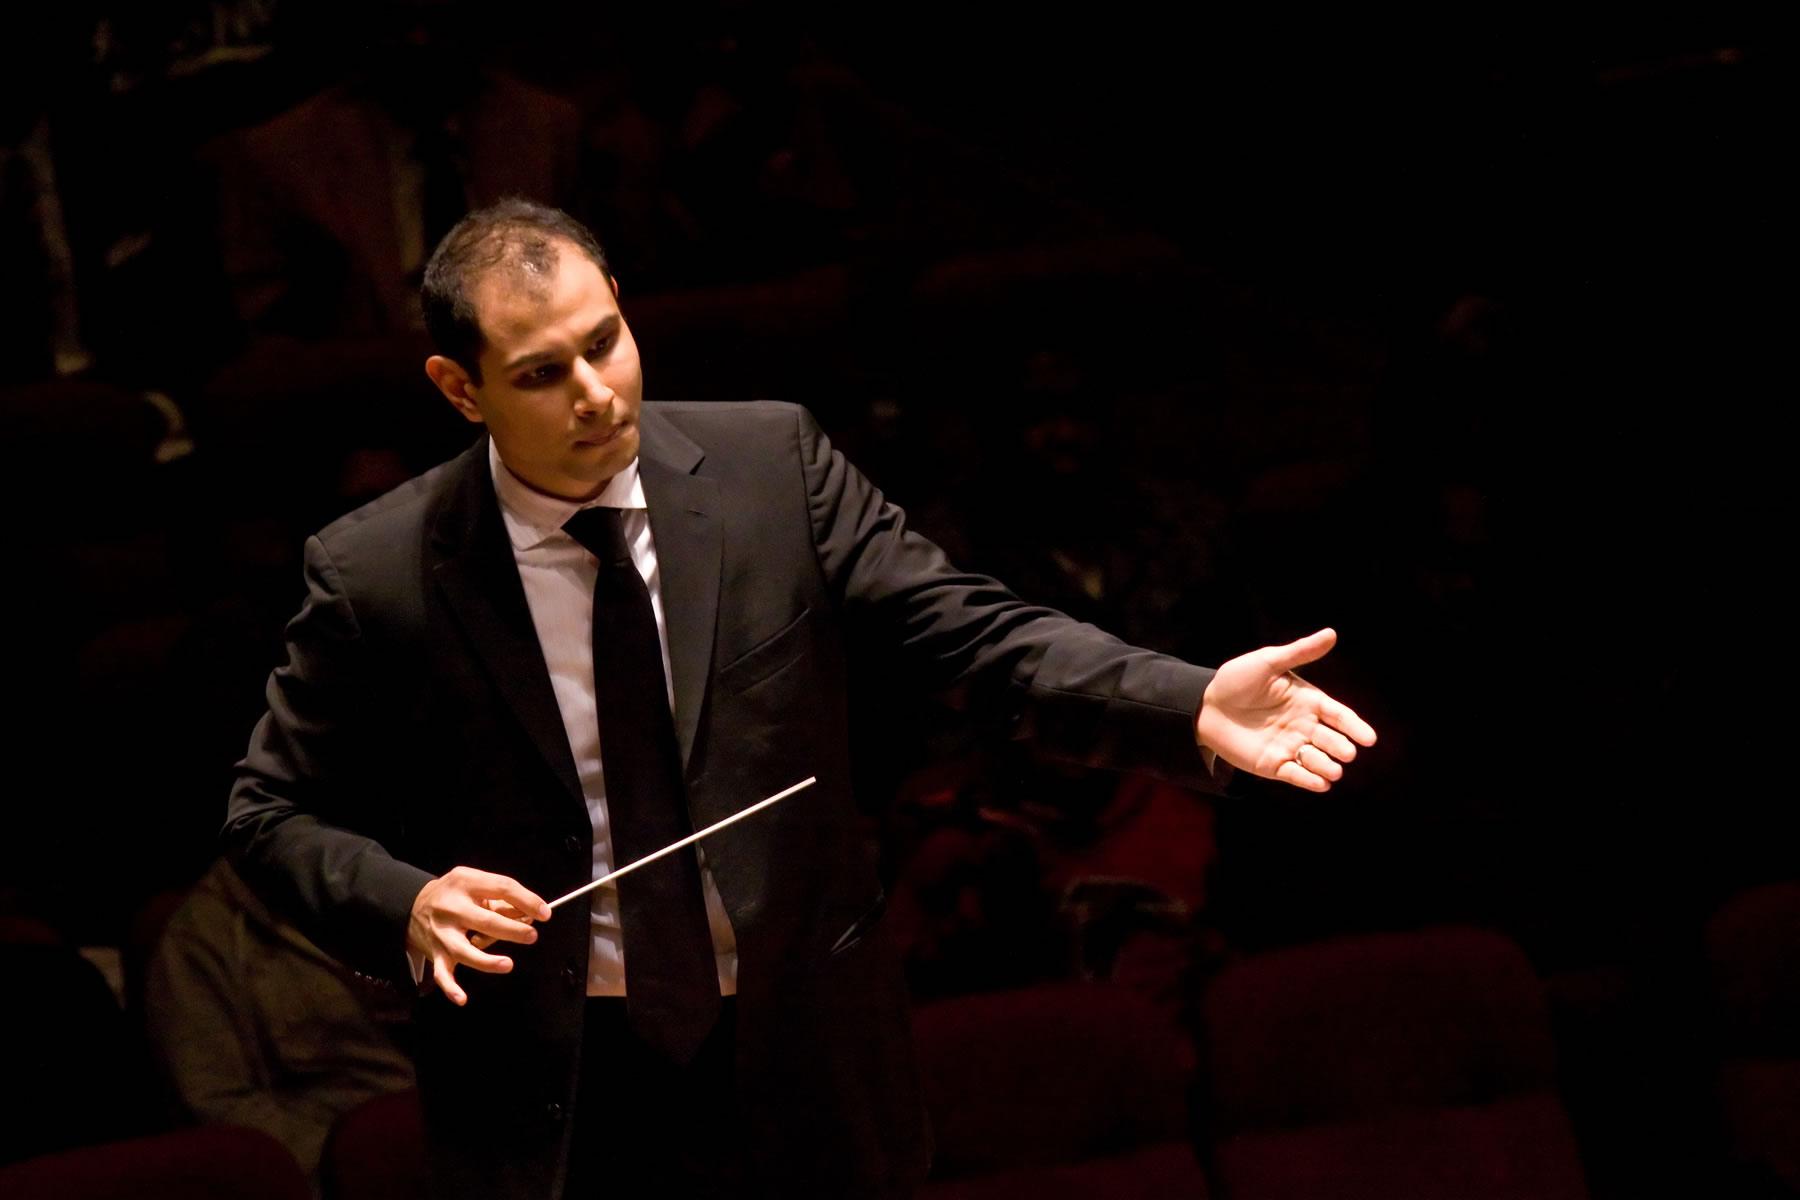 Symphoria conductor Fawzi Haimor